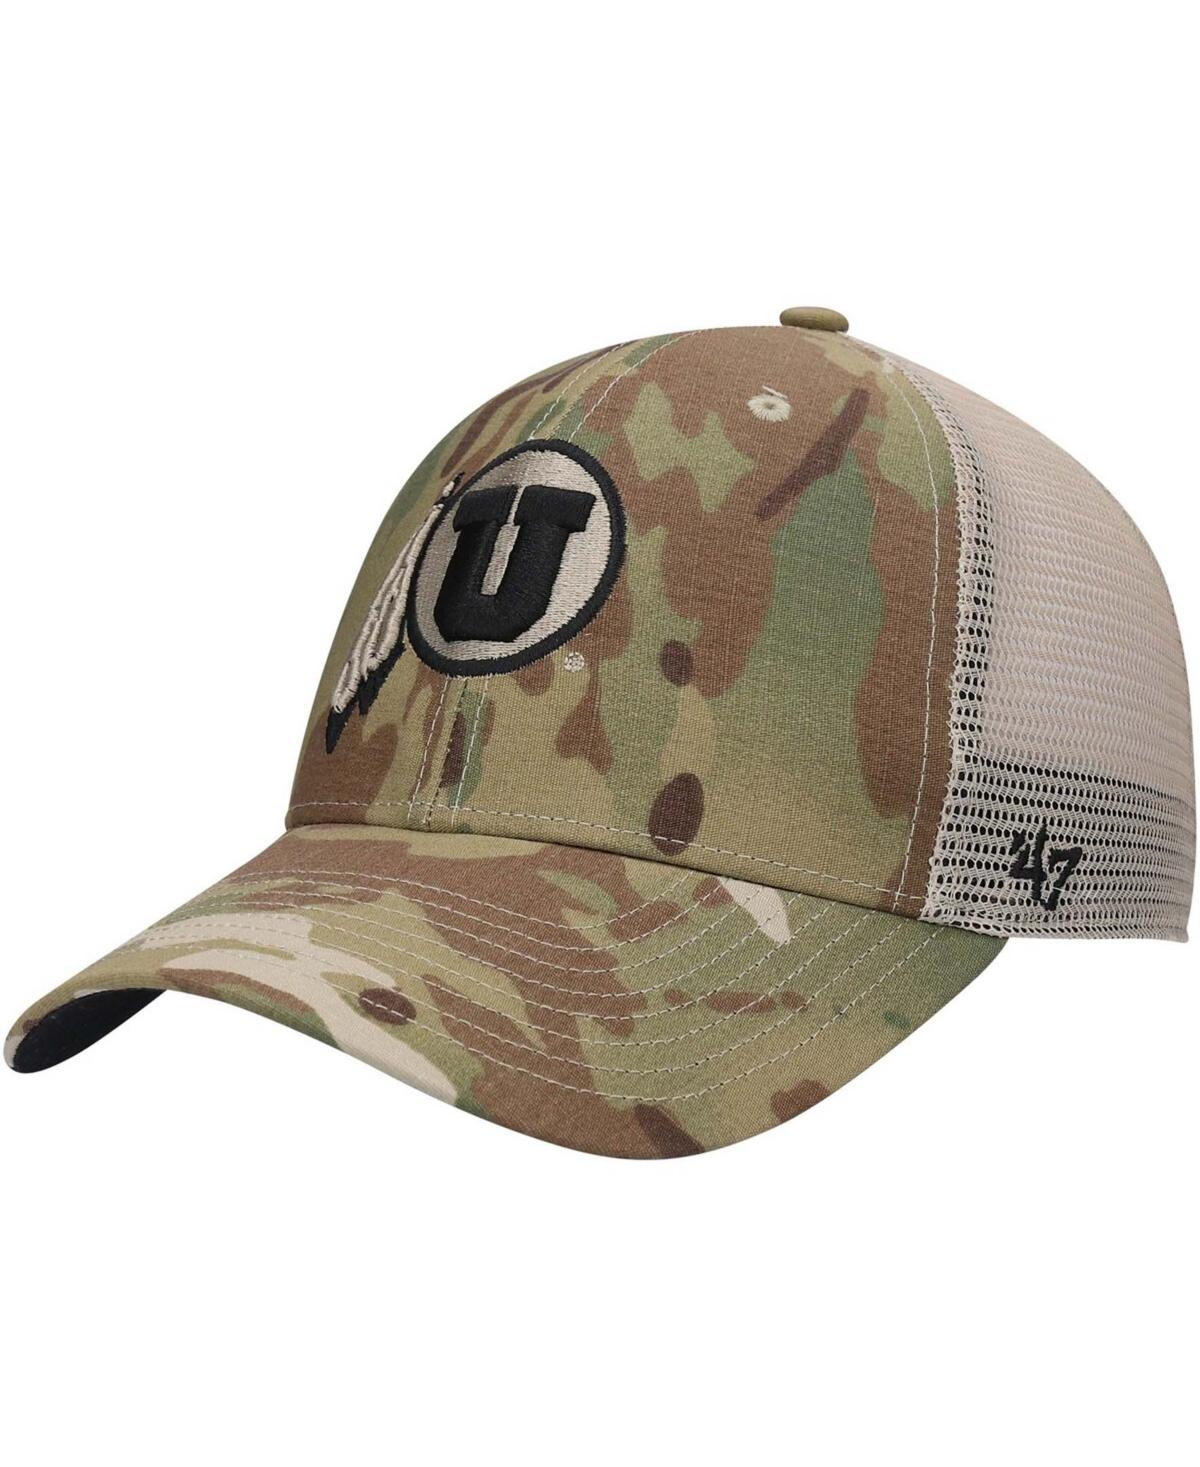 47 Brand Utah Utes Oht Appreciation Colonel Mvp Adjustable Snapback Cap